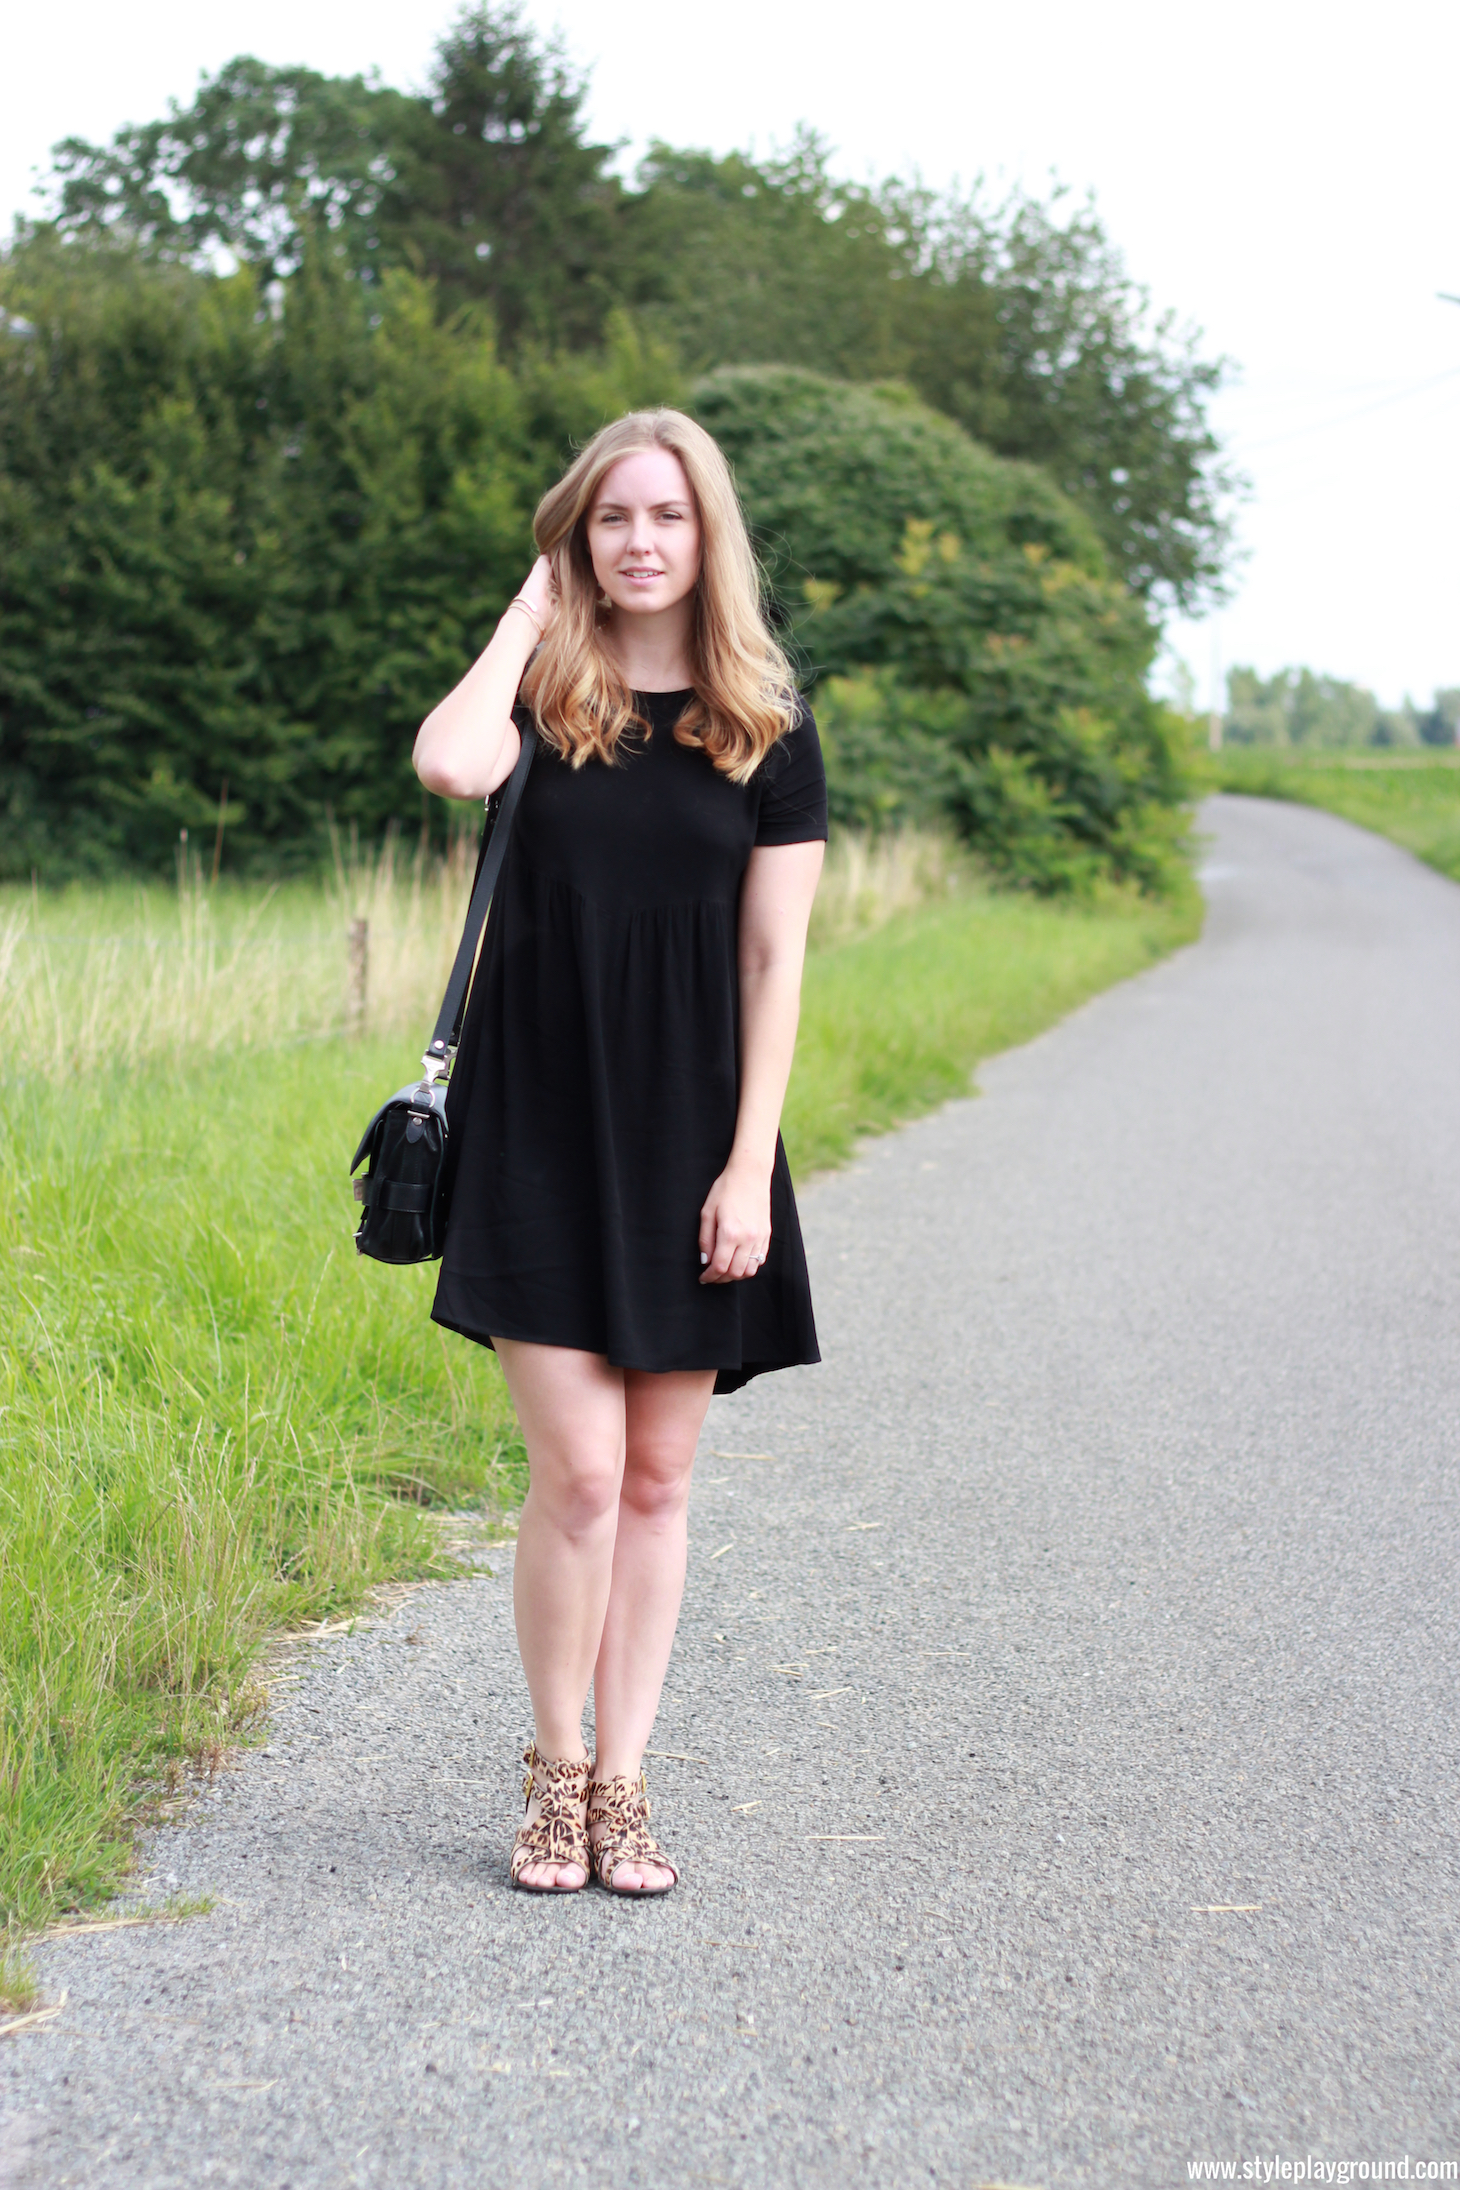 Axelle Blanpain of Style playground is wearing a Bash dress, Proenza Schouler PS11 bag, River Island shoes, Cartier love bracelet & Tiffany T bracelet